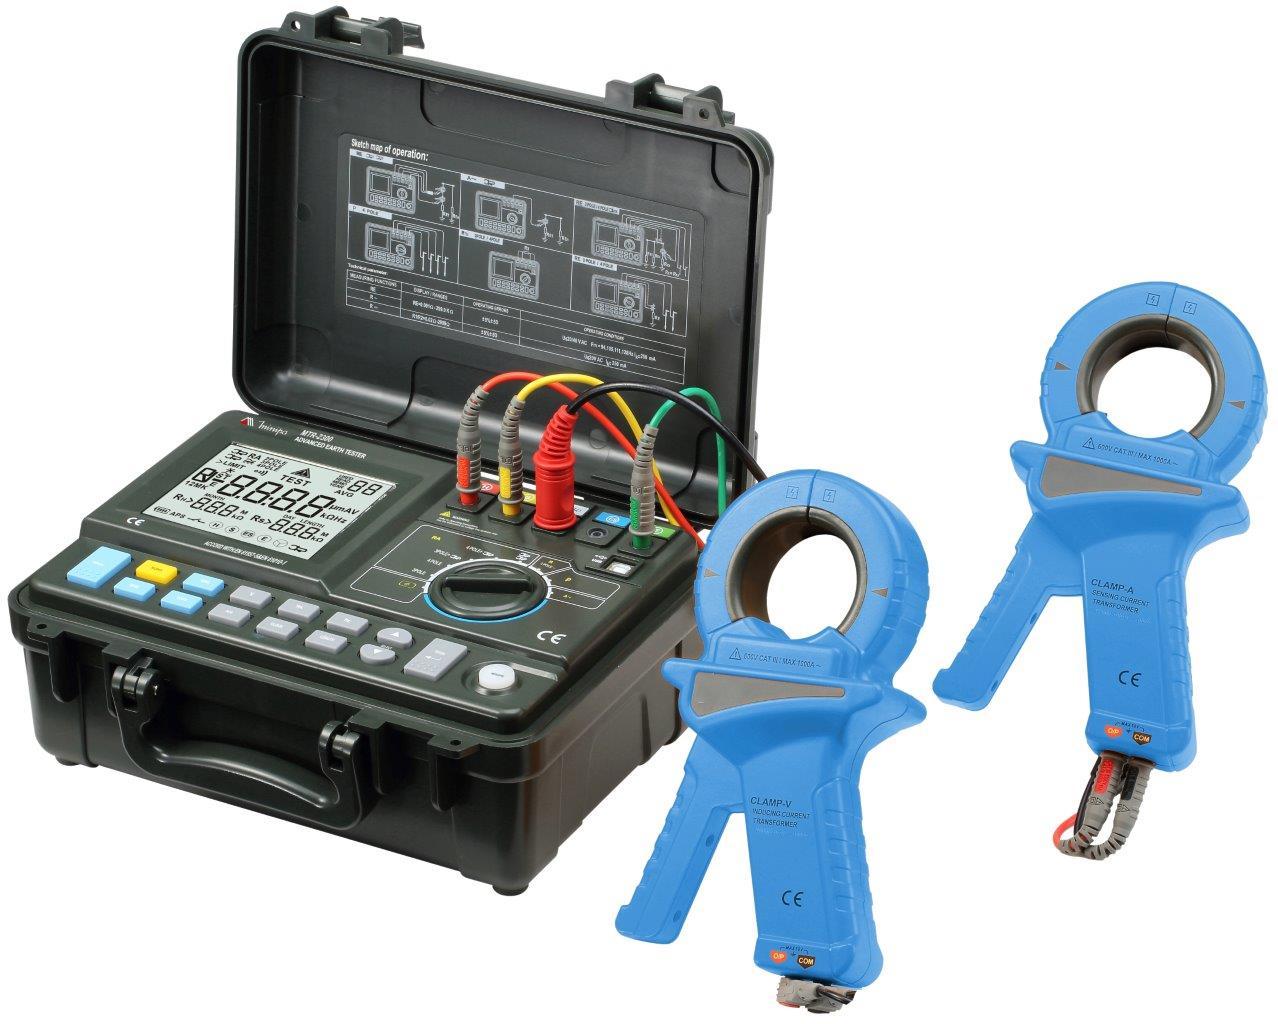 Terrômetro Digital Minipa MTR-2300  - MRE Ferramentas